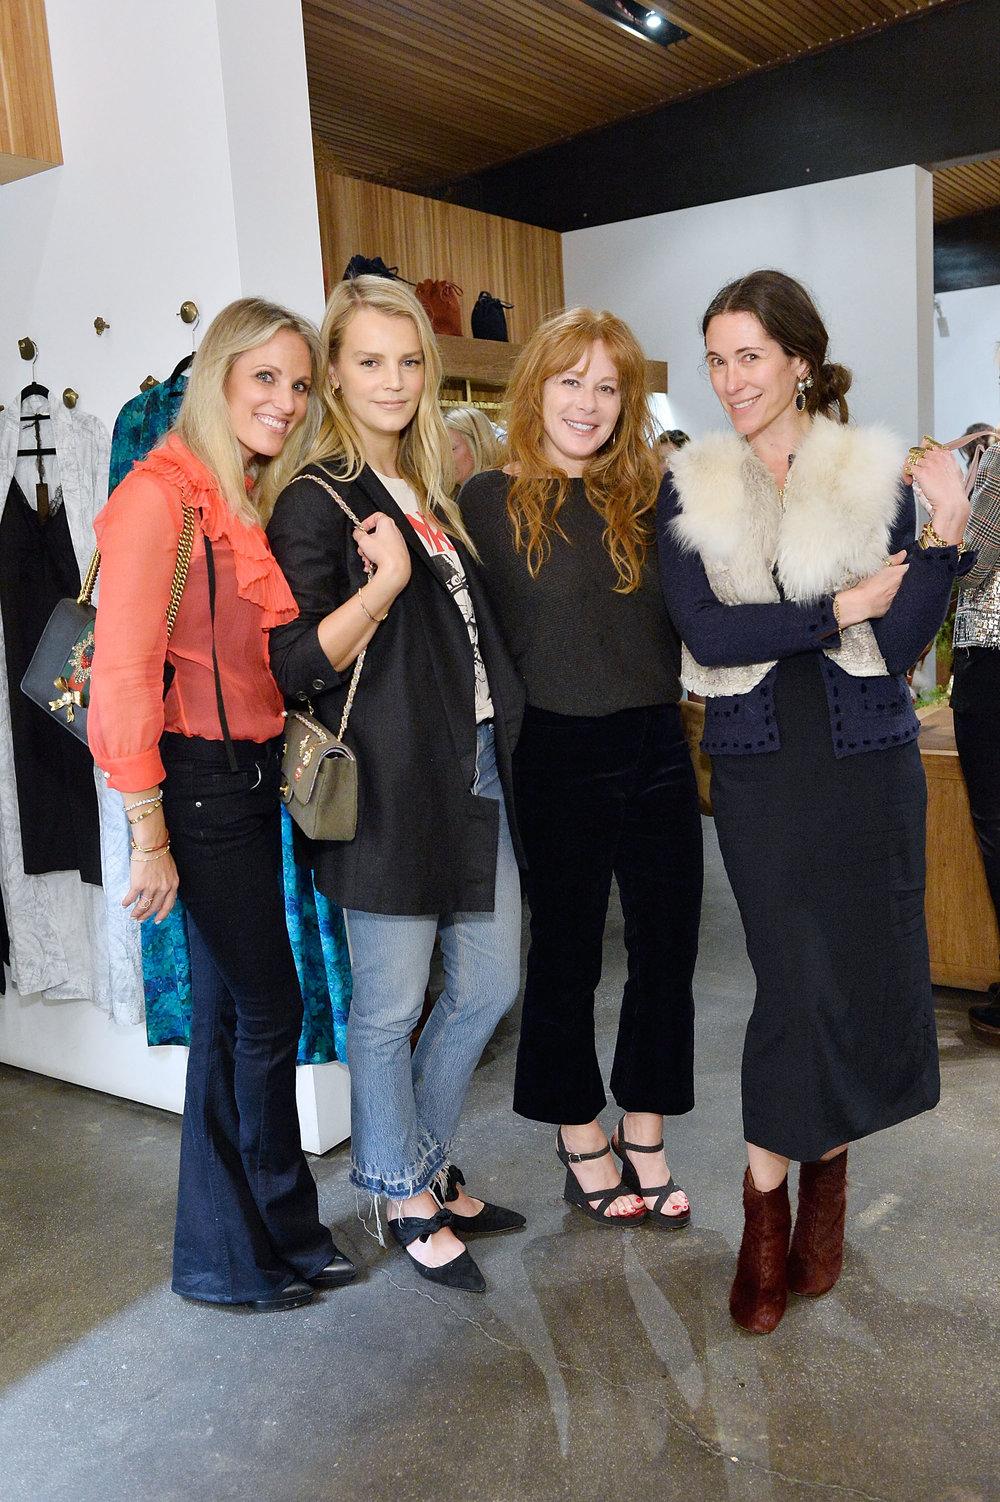 Krista KD, KellySawyer, Kimberly Muller & Lisanne Frank